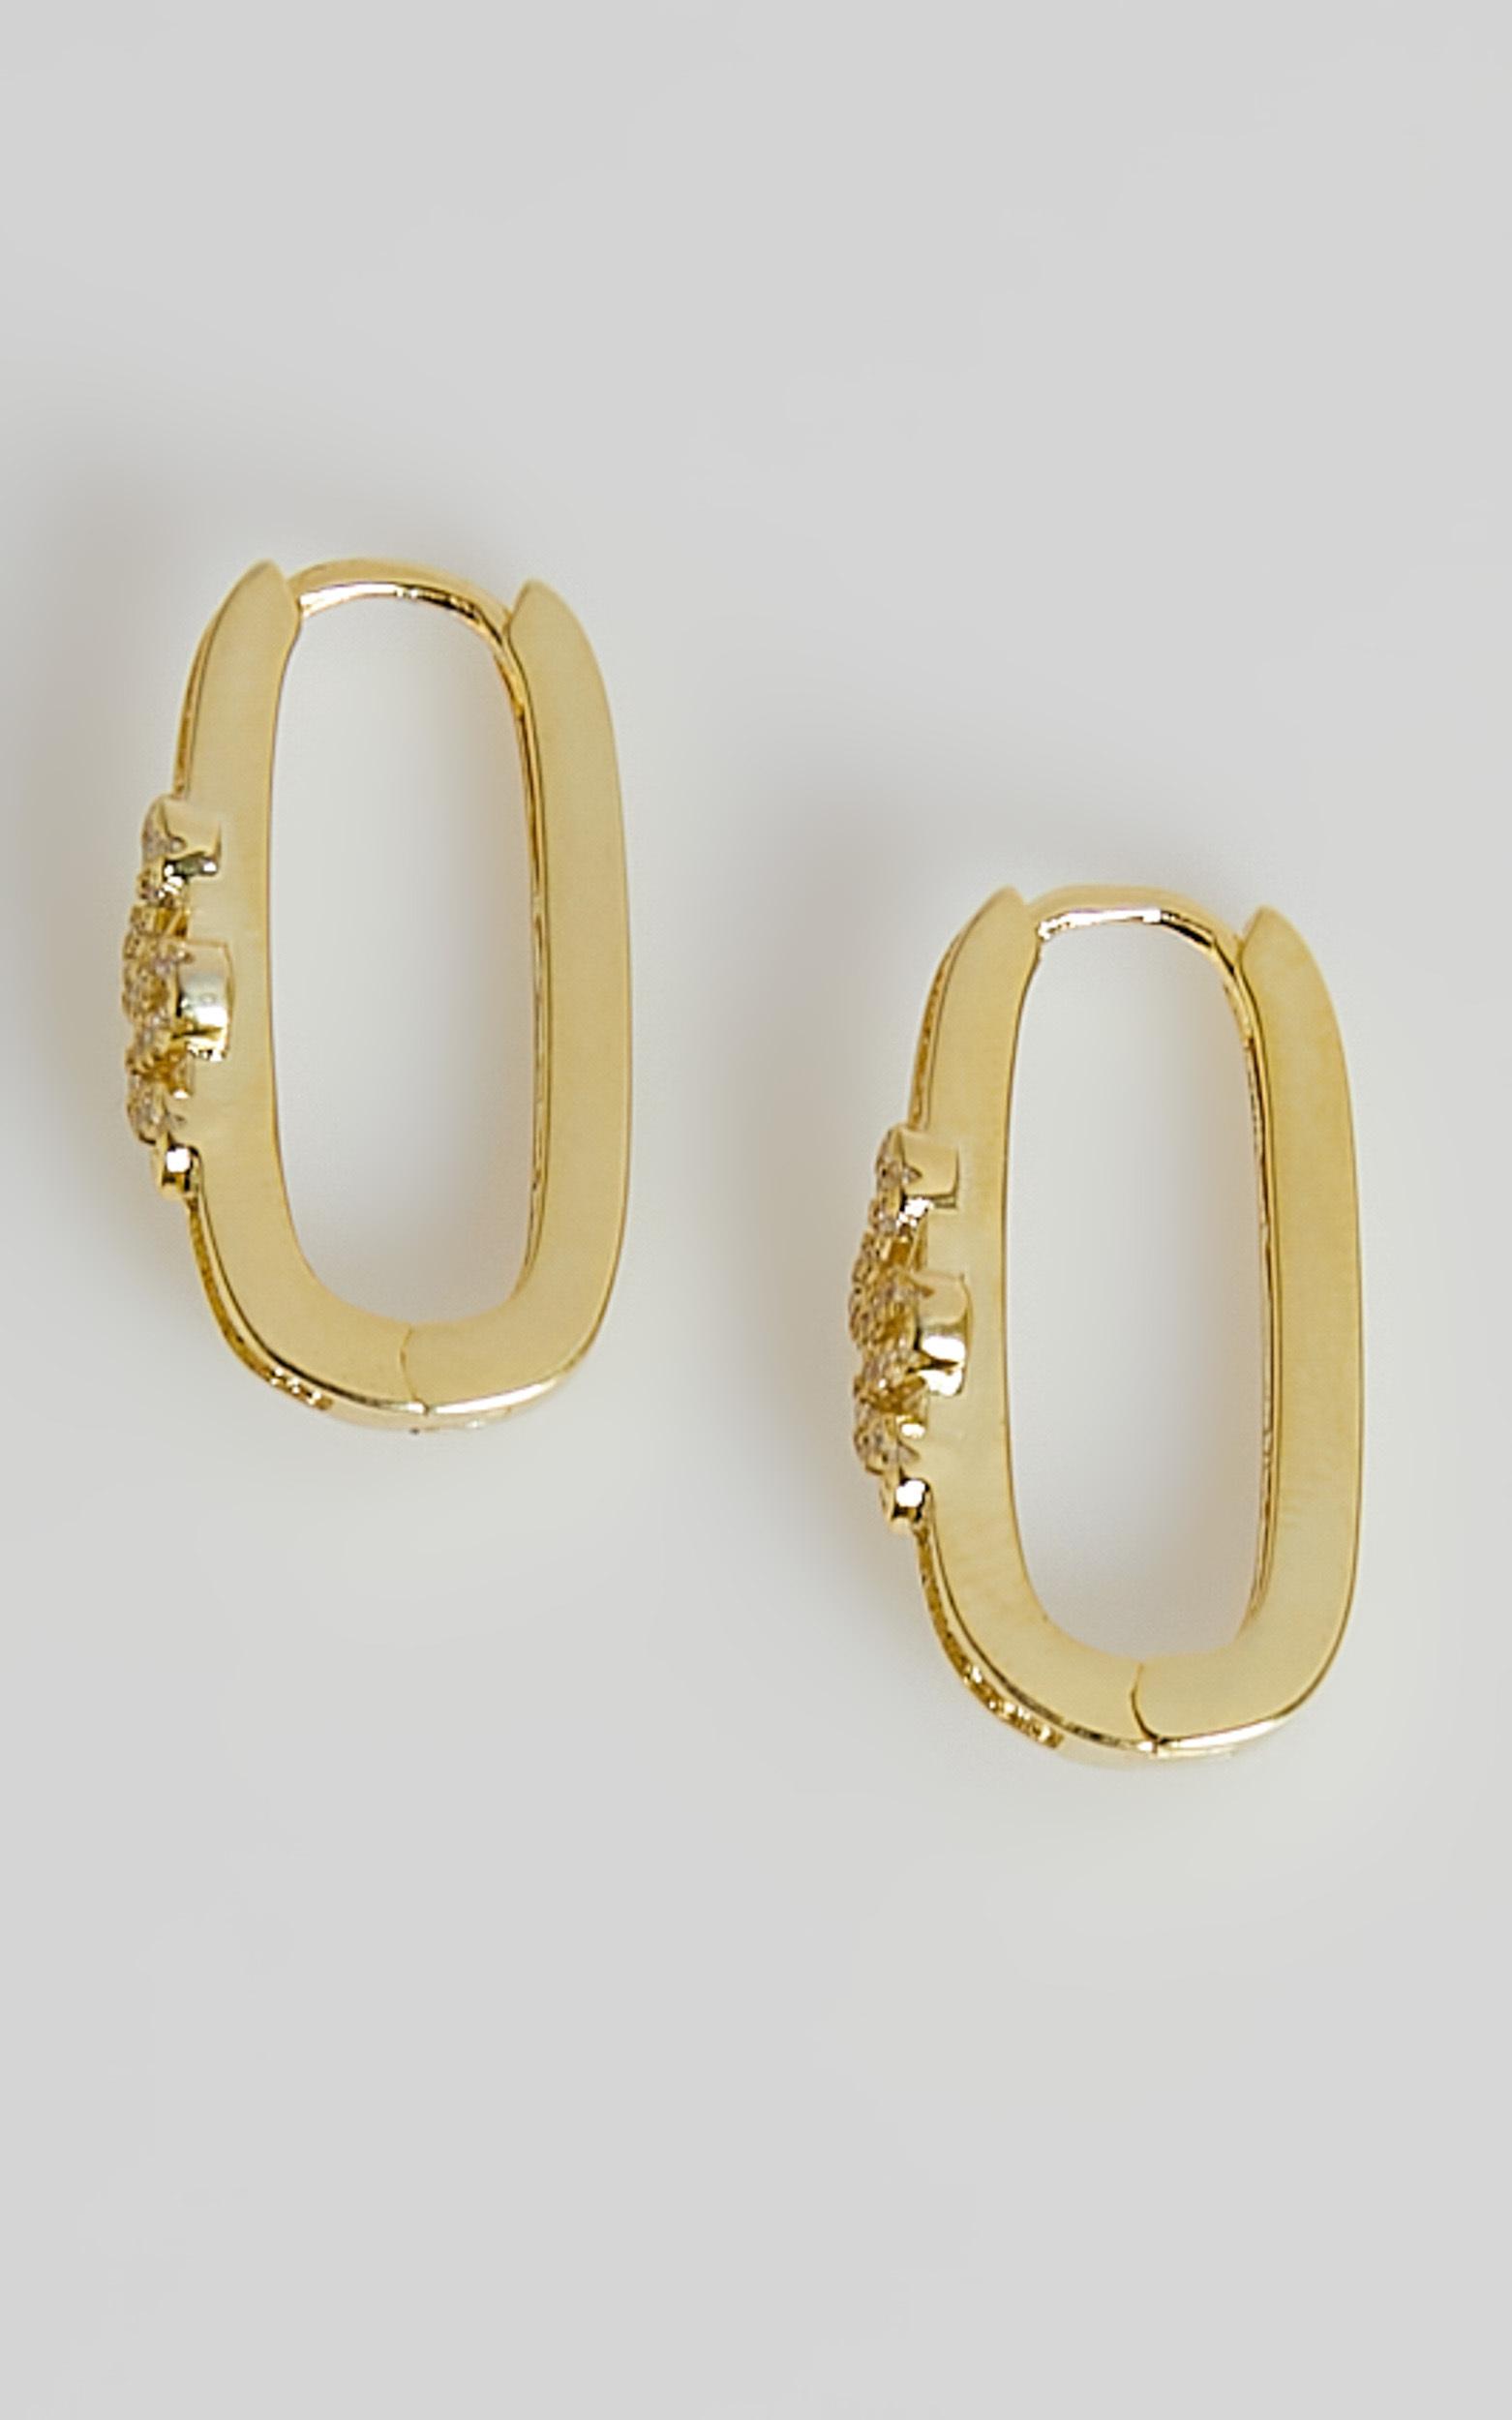 Izoa - Viper Hoop Earrings in Gold, GLD1, hi-res image number null